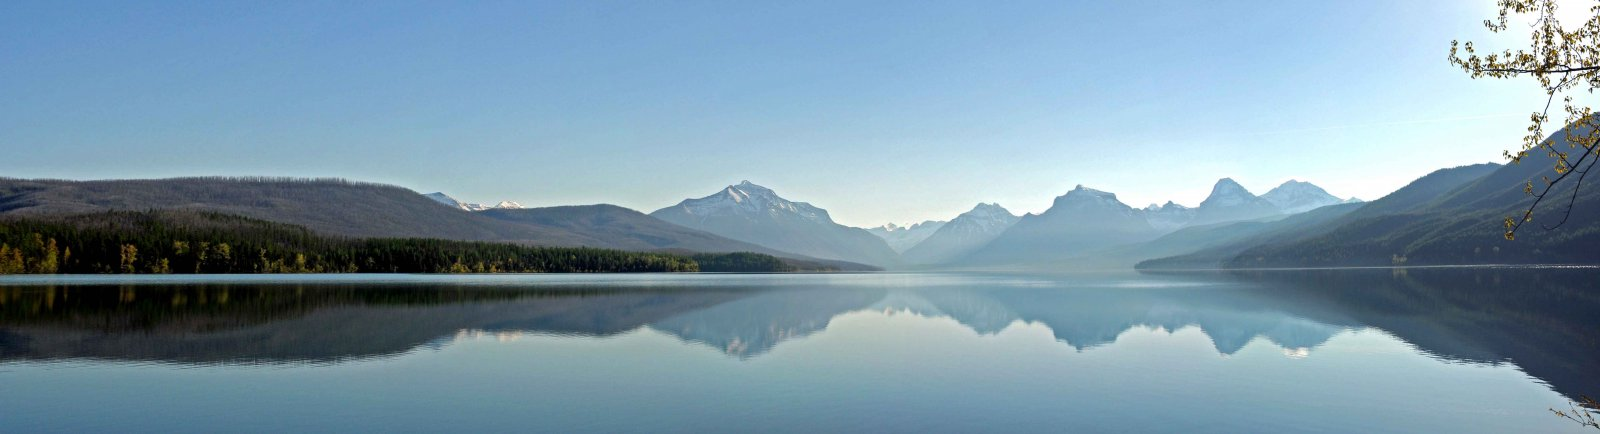 Click image for larger version  Name:Lake McDonald Pano-a.jpg Views:77 Size:79.3 KB ID:150391